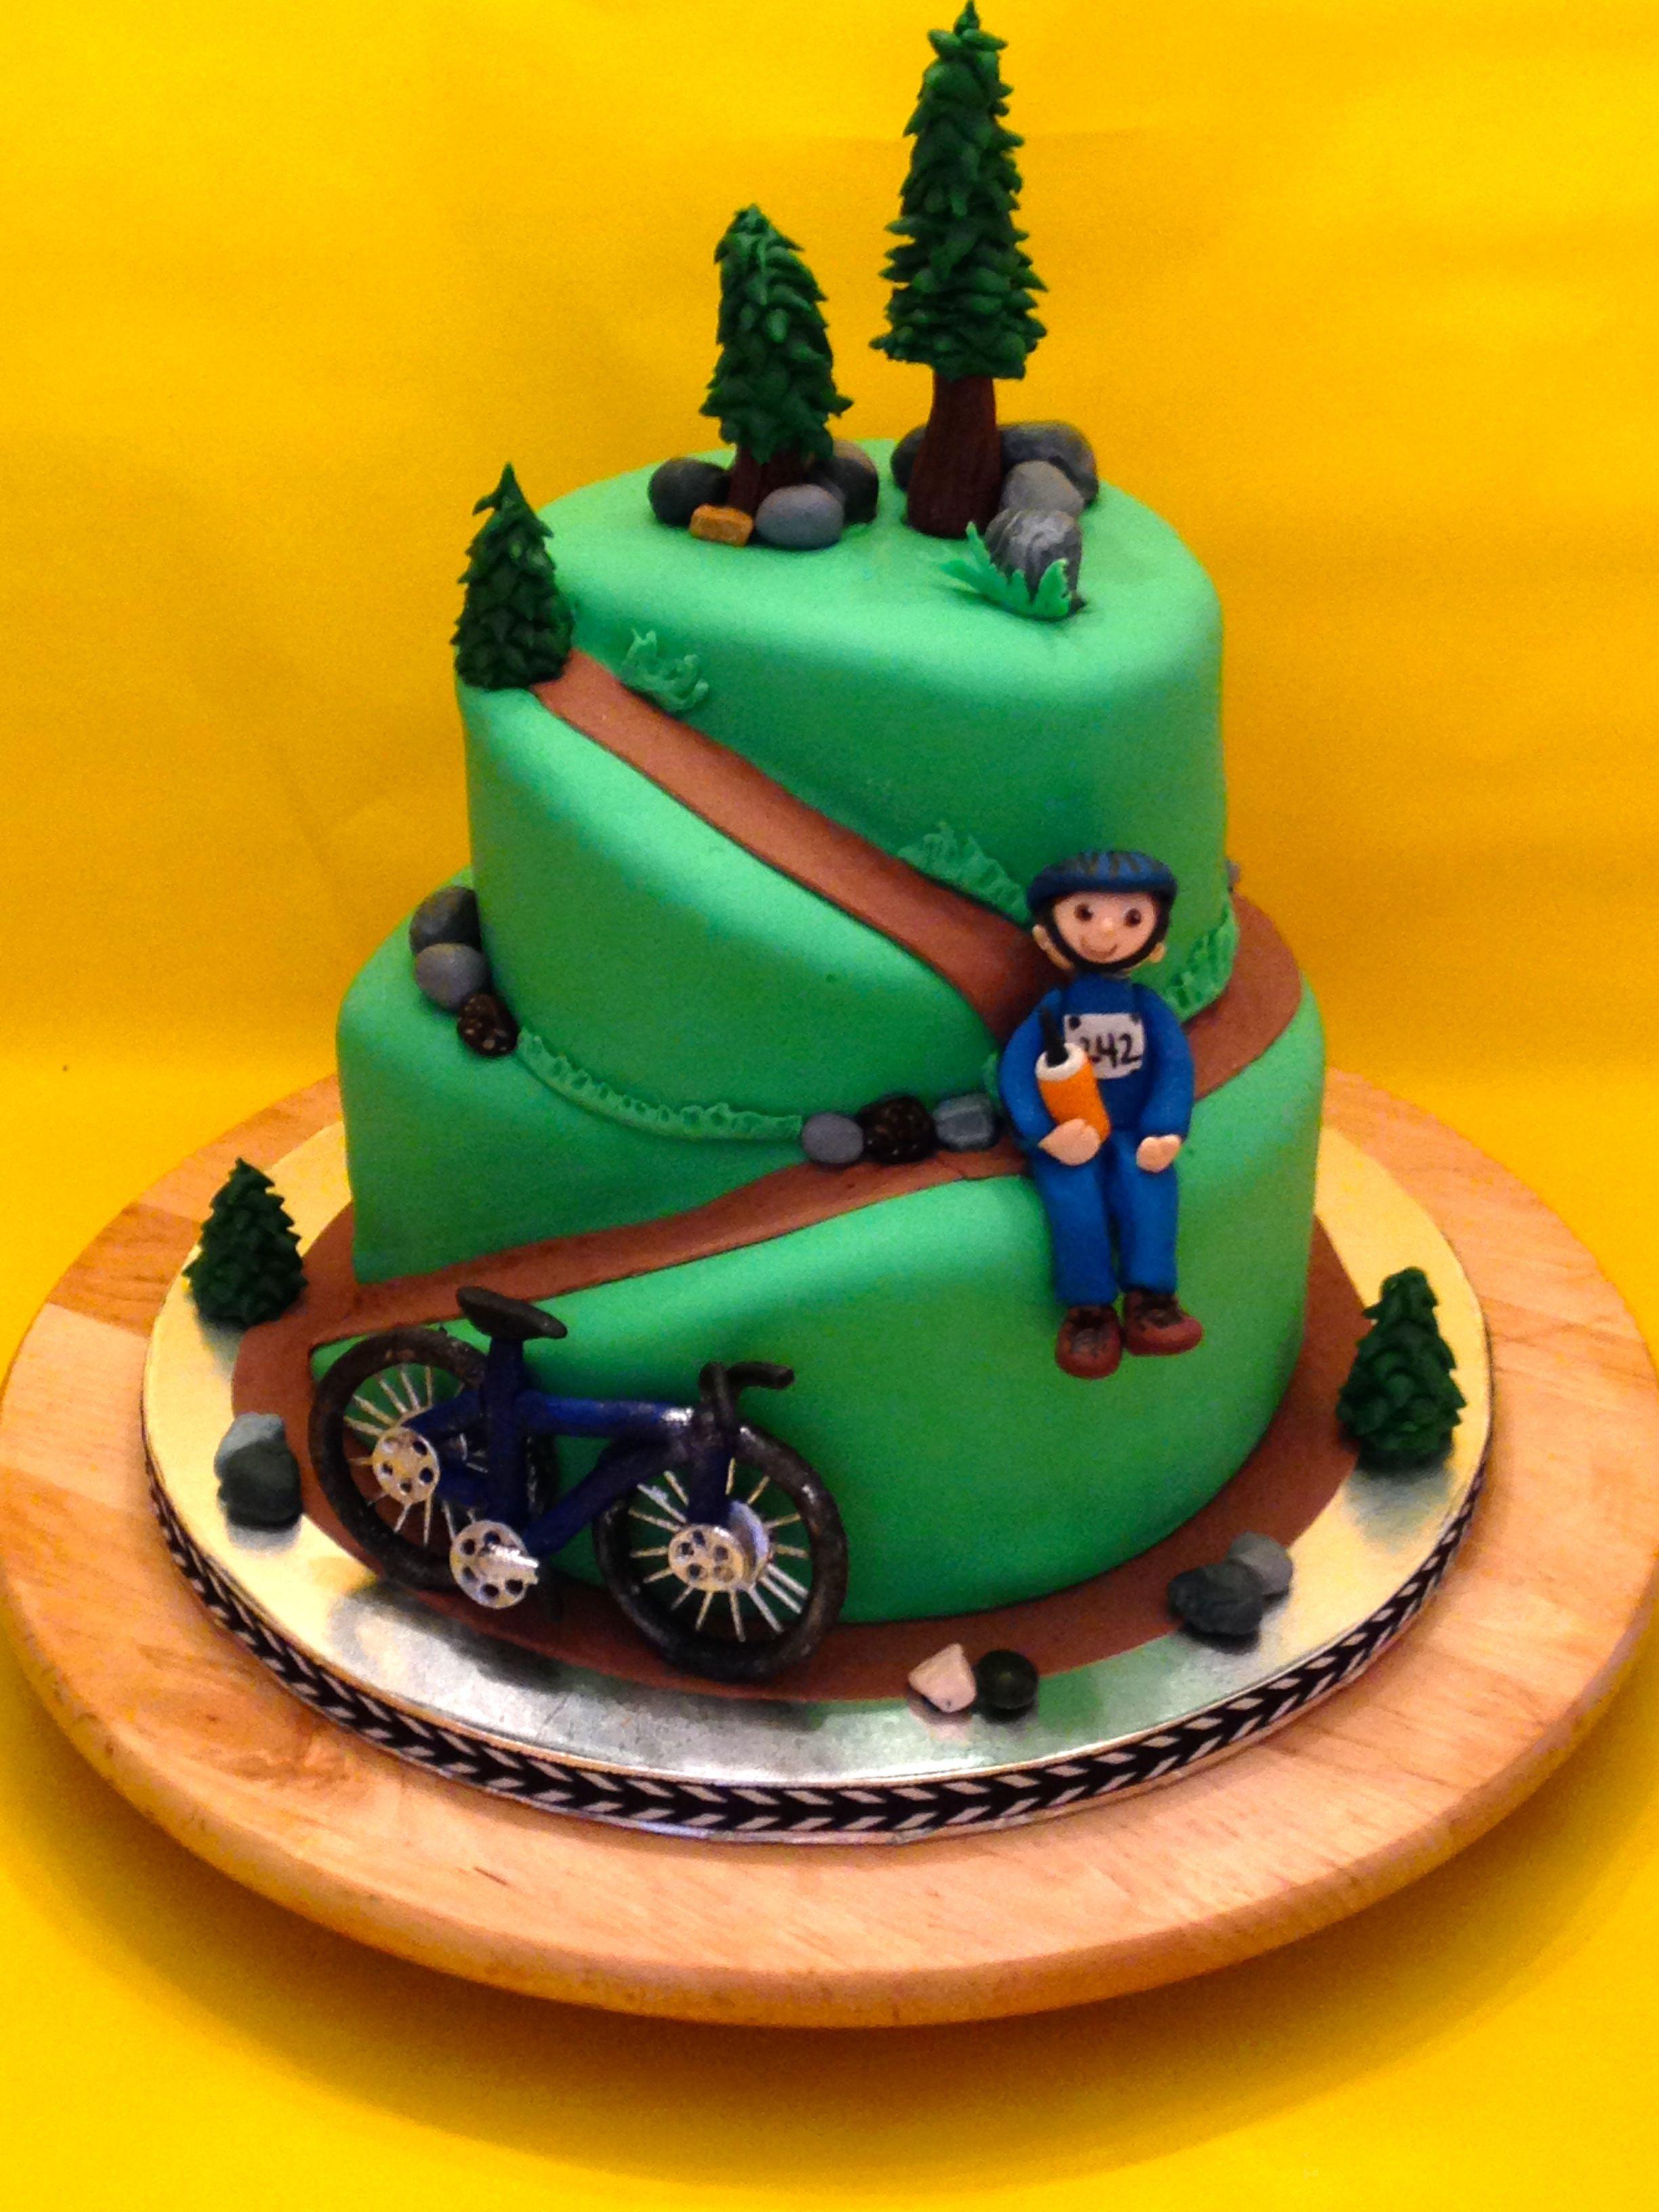 With Bike Generator Birthday Name Cake